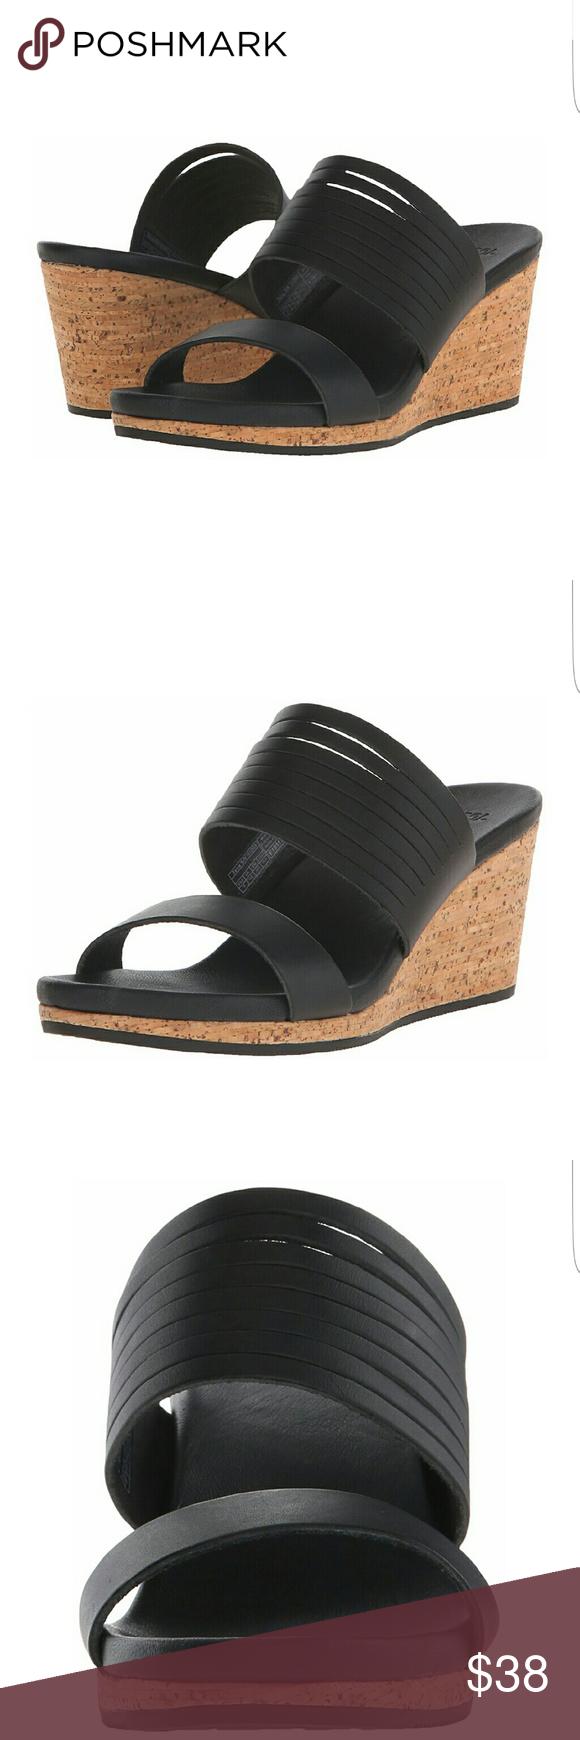 Teva Arrabelle slide Black wedge Teva slides. Teva Shoes Wedges